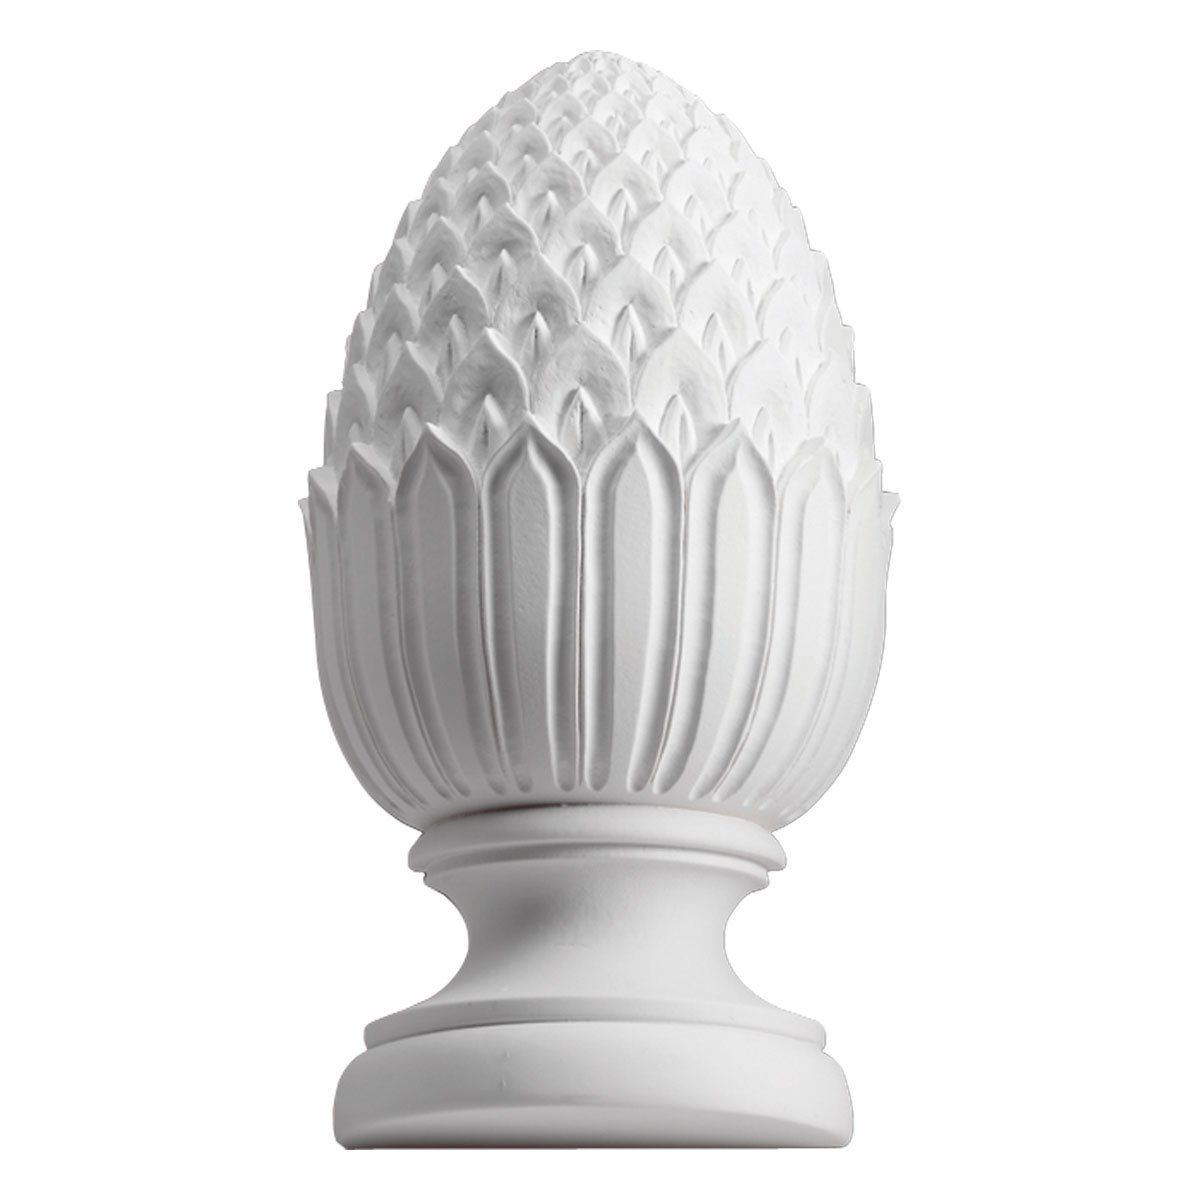 Fypon PHFR5X11 5 5/8''OW x 11''H x 4 3/4''BW Full Round Urethane Pineapple